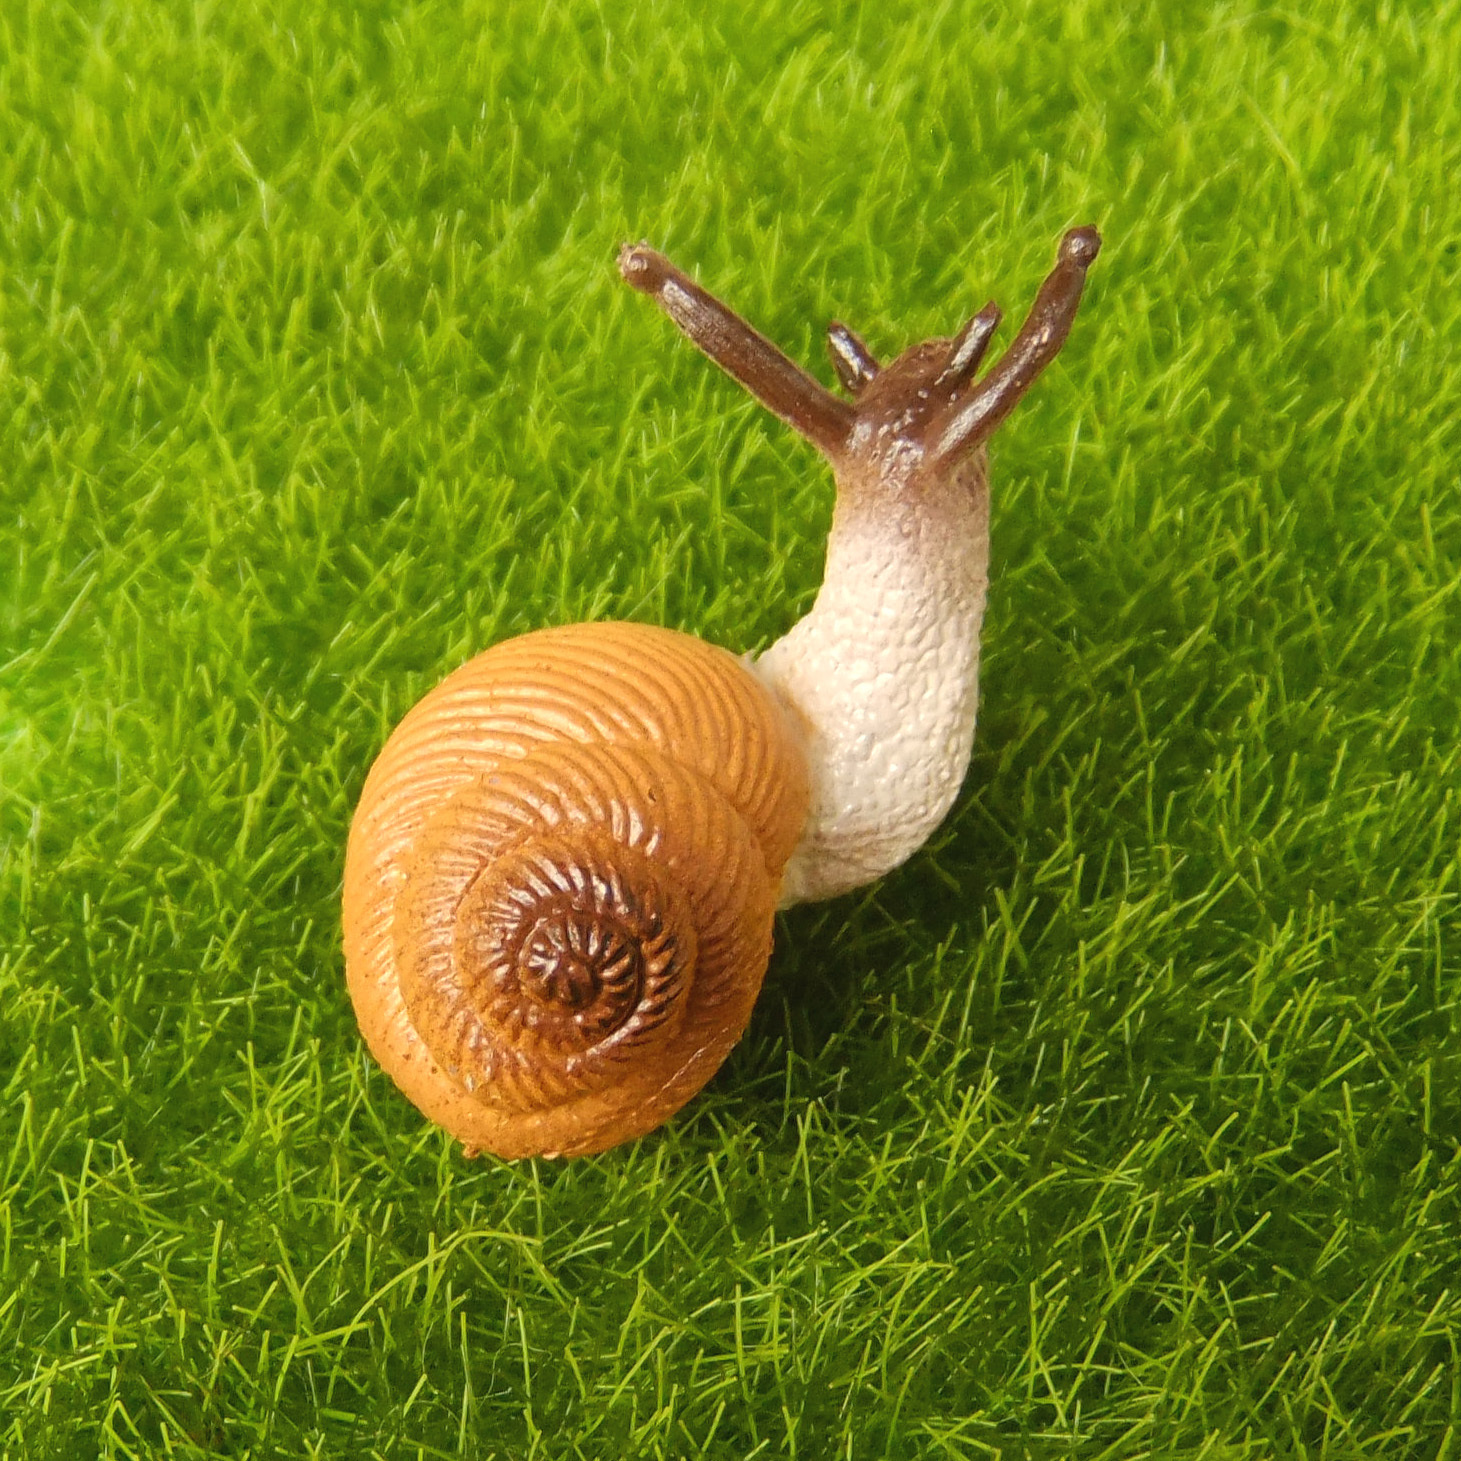 4 Pcs Small Snail Cute Lifelike Fairy Garden Terrarium Decor Figurine Animal Toy Hlpsocialsquare Com